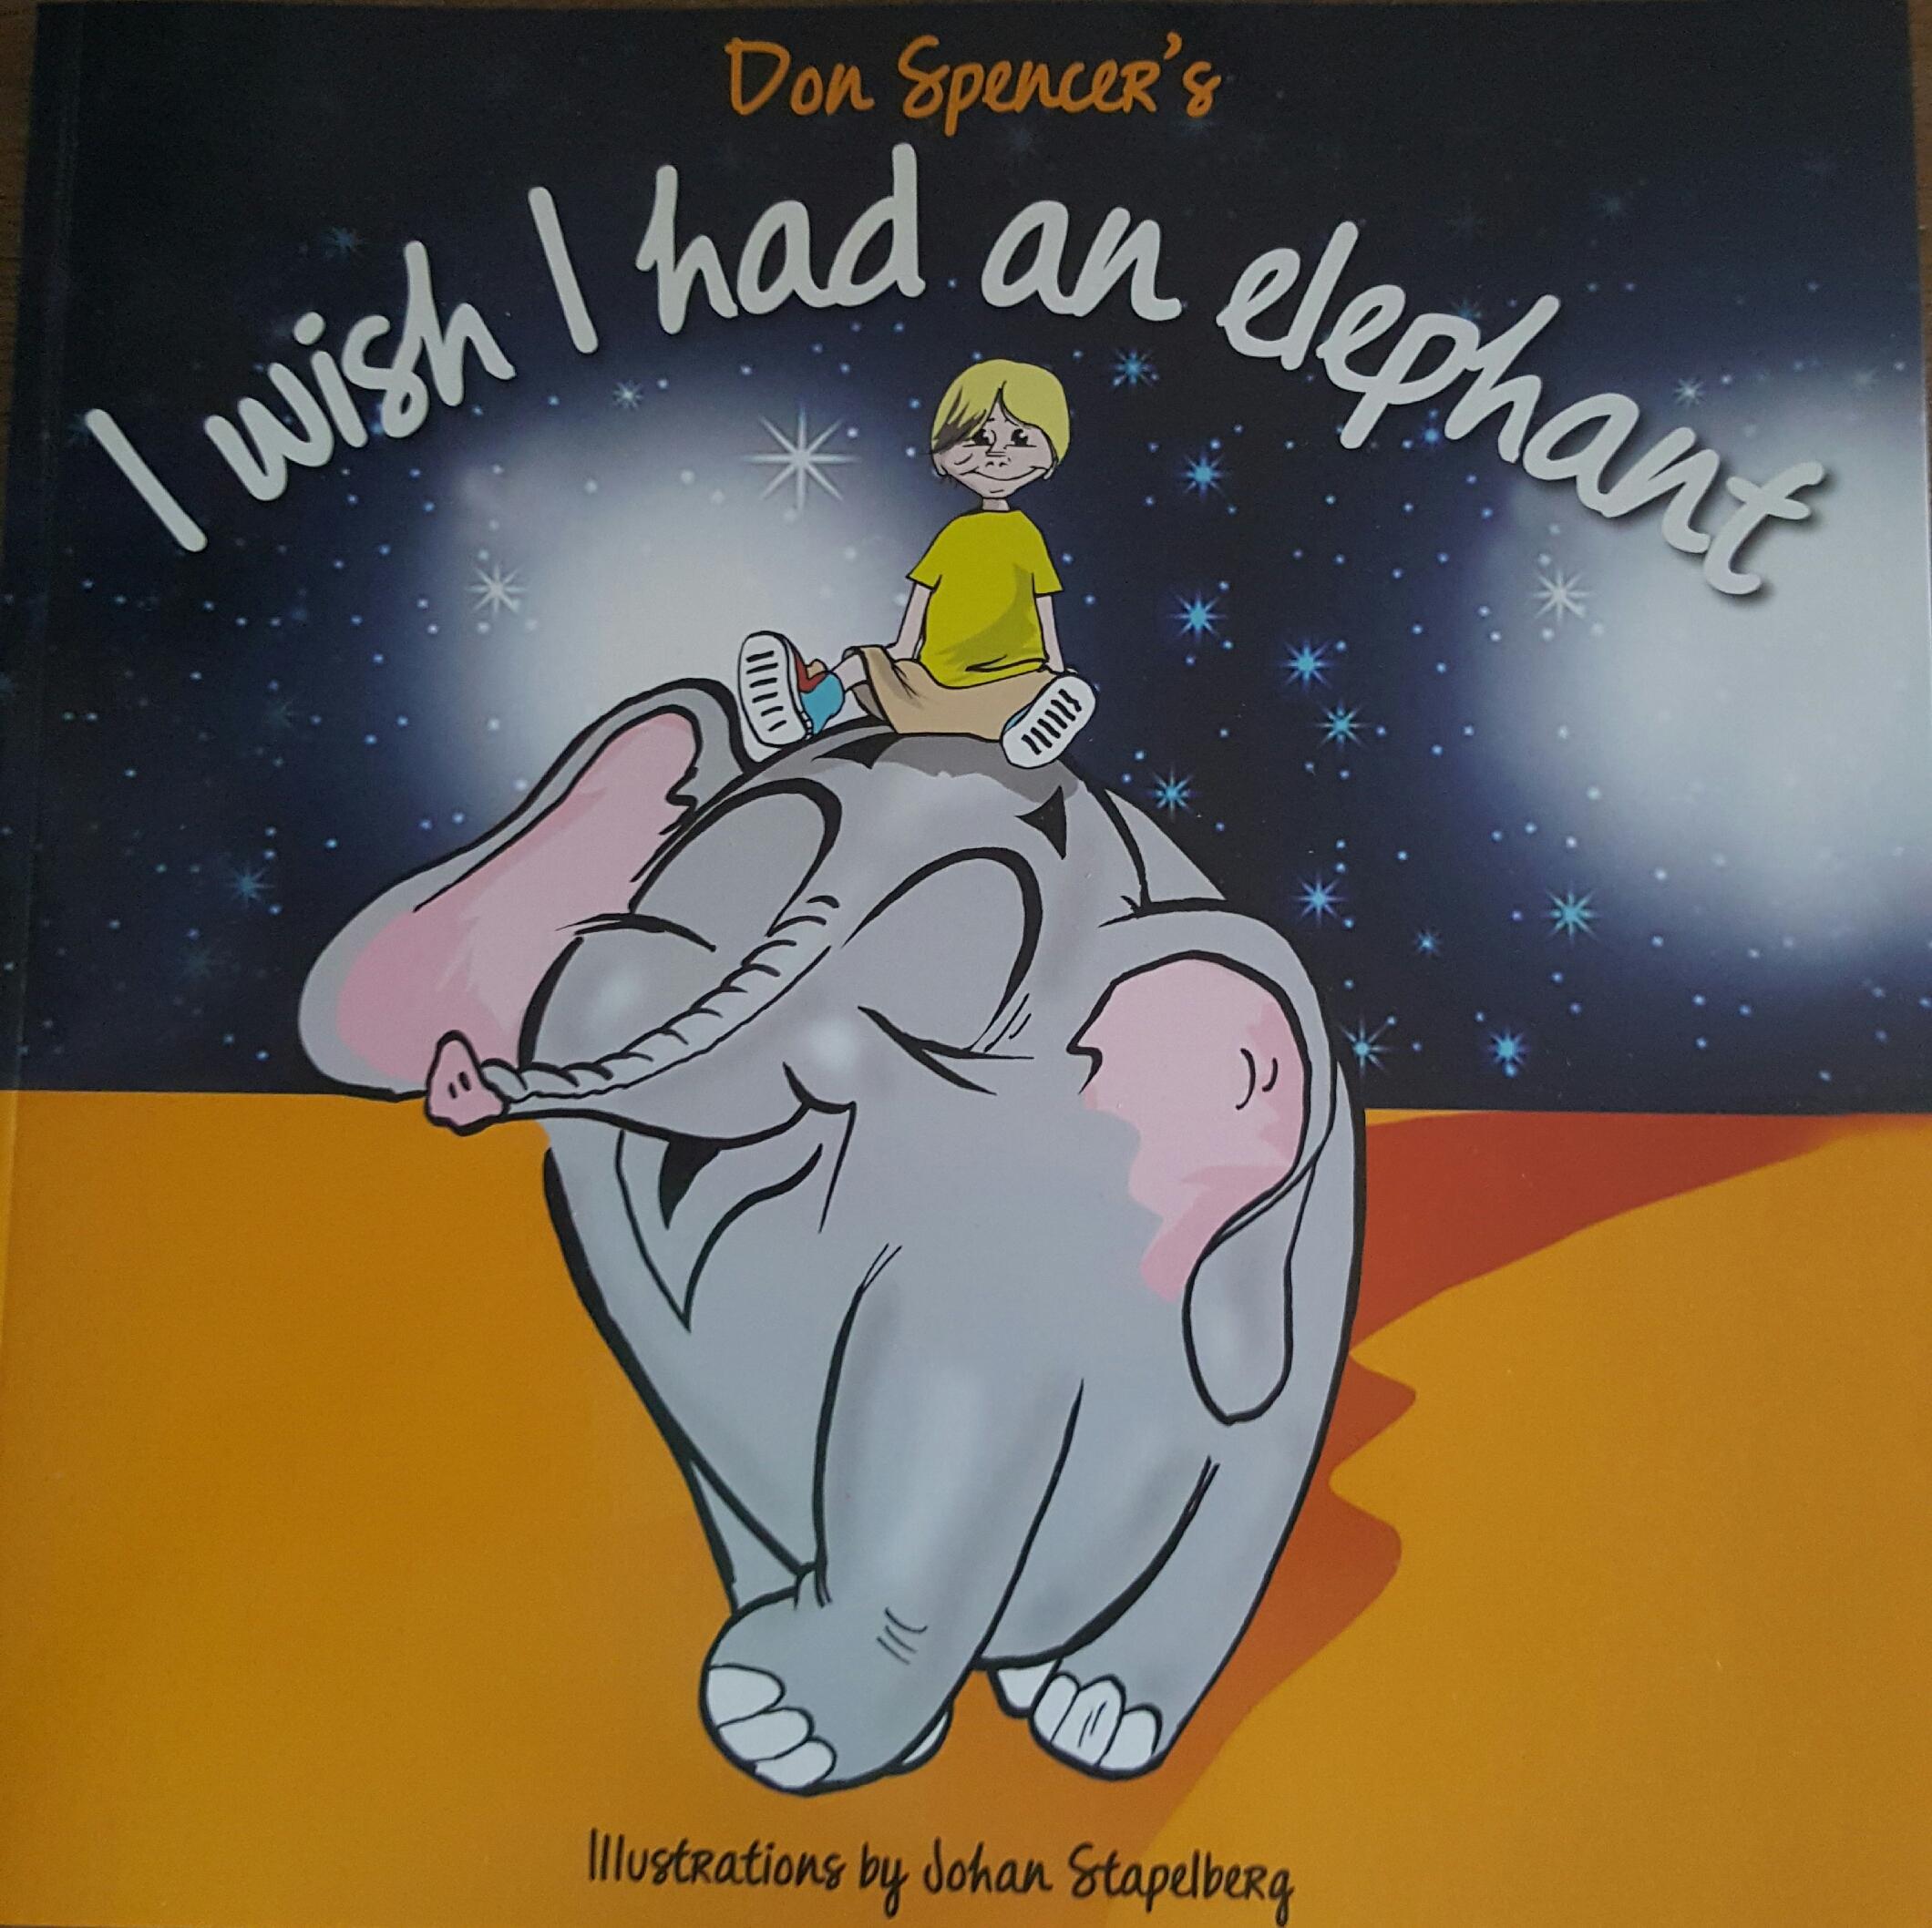 Little Rockers Radio - Don Spencer - I wish I had an elephant